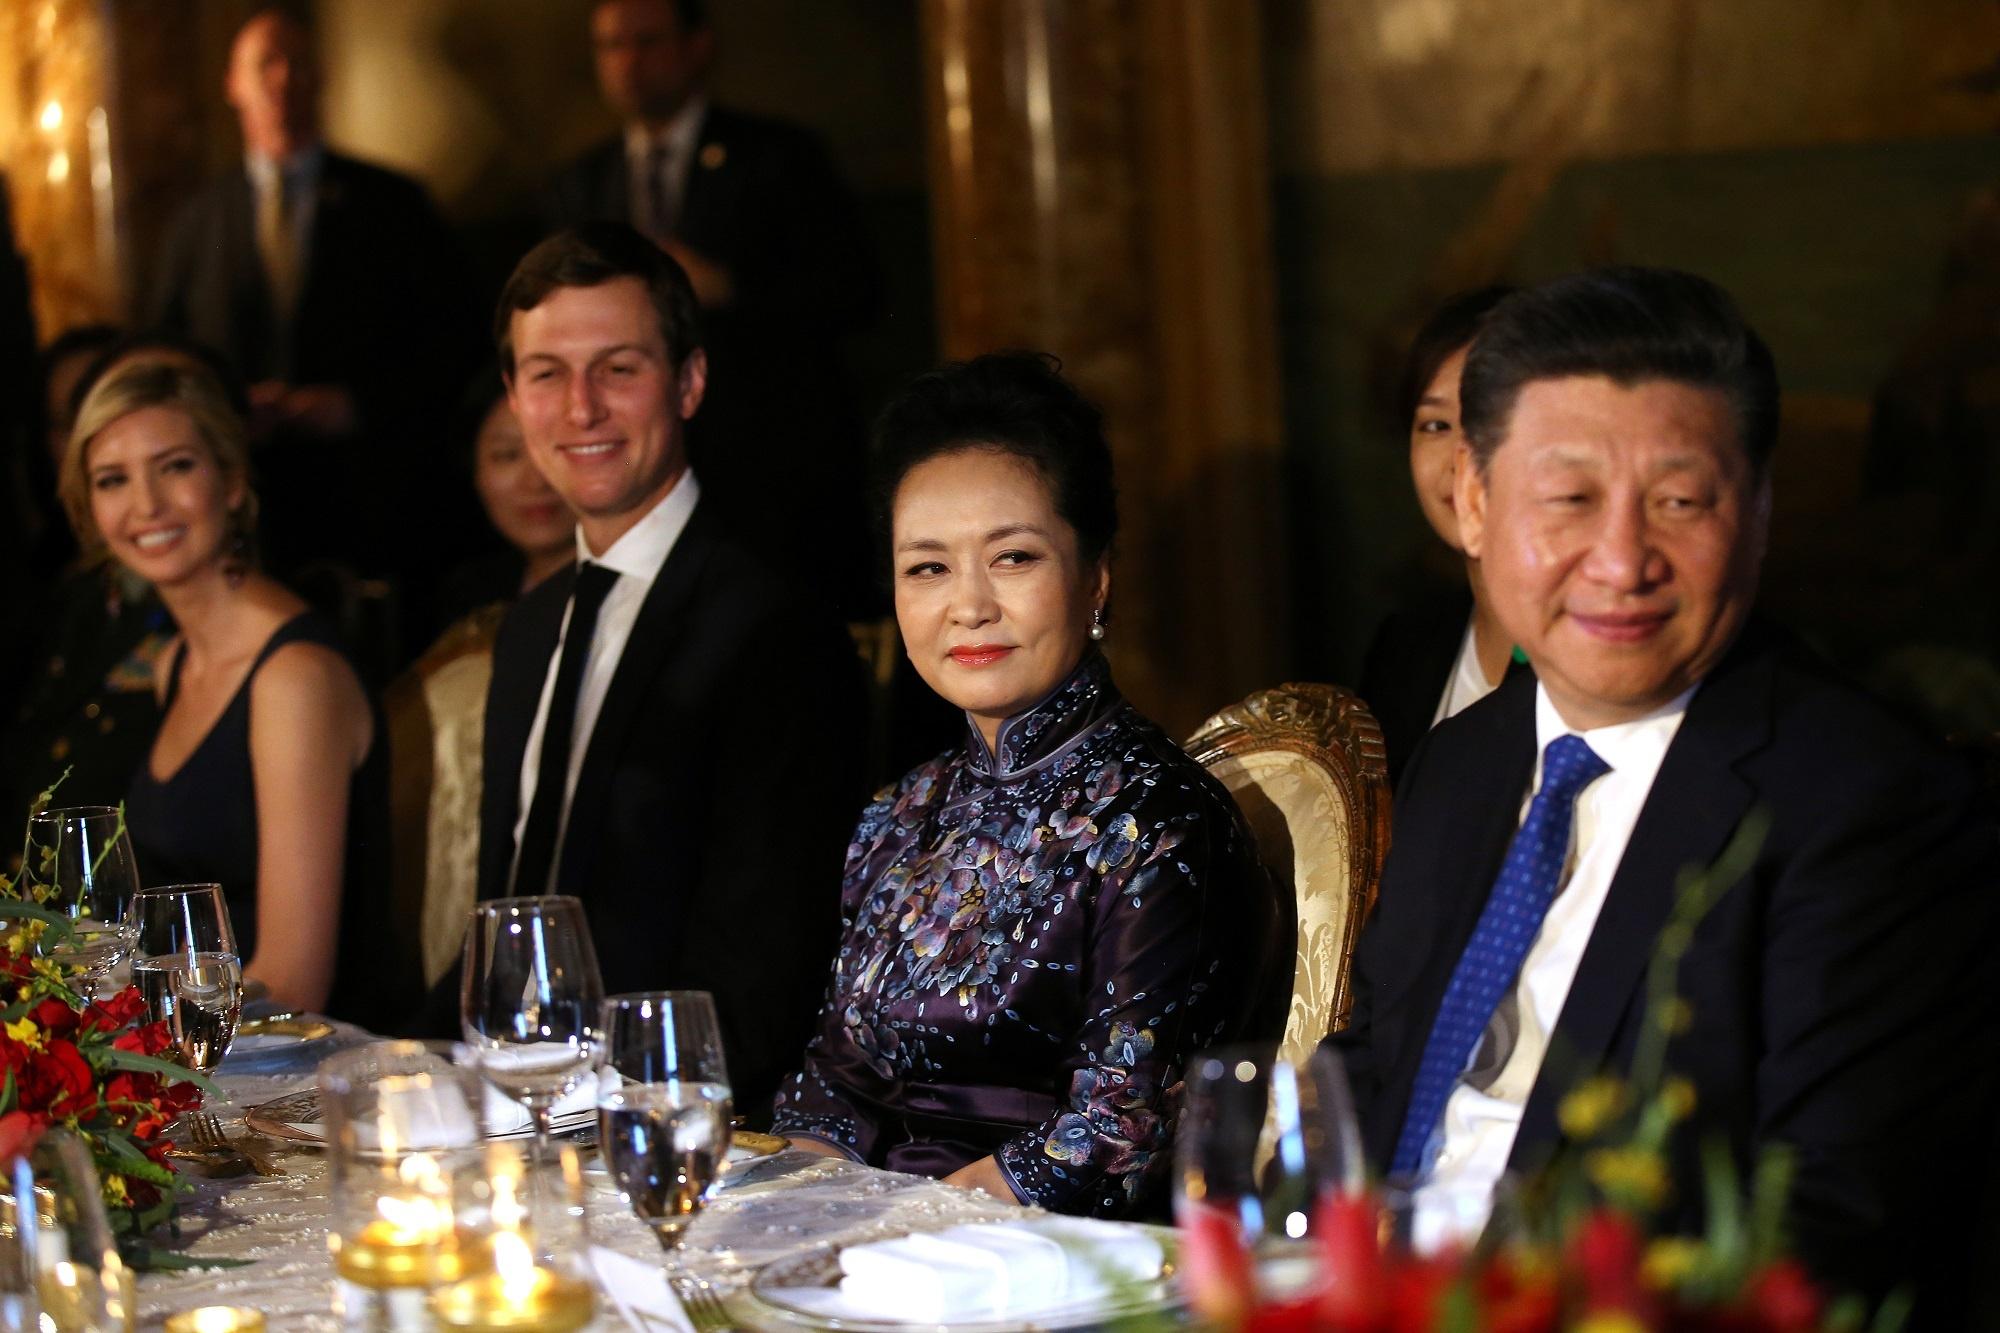 At chu bai cua Trung Quoc voi My: Con re Tong thong Trump hinh anh 12